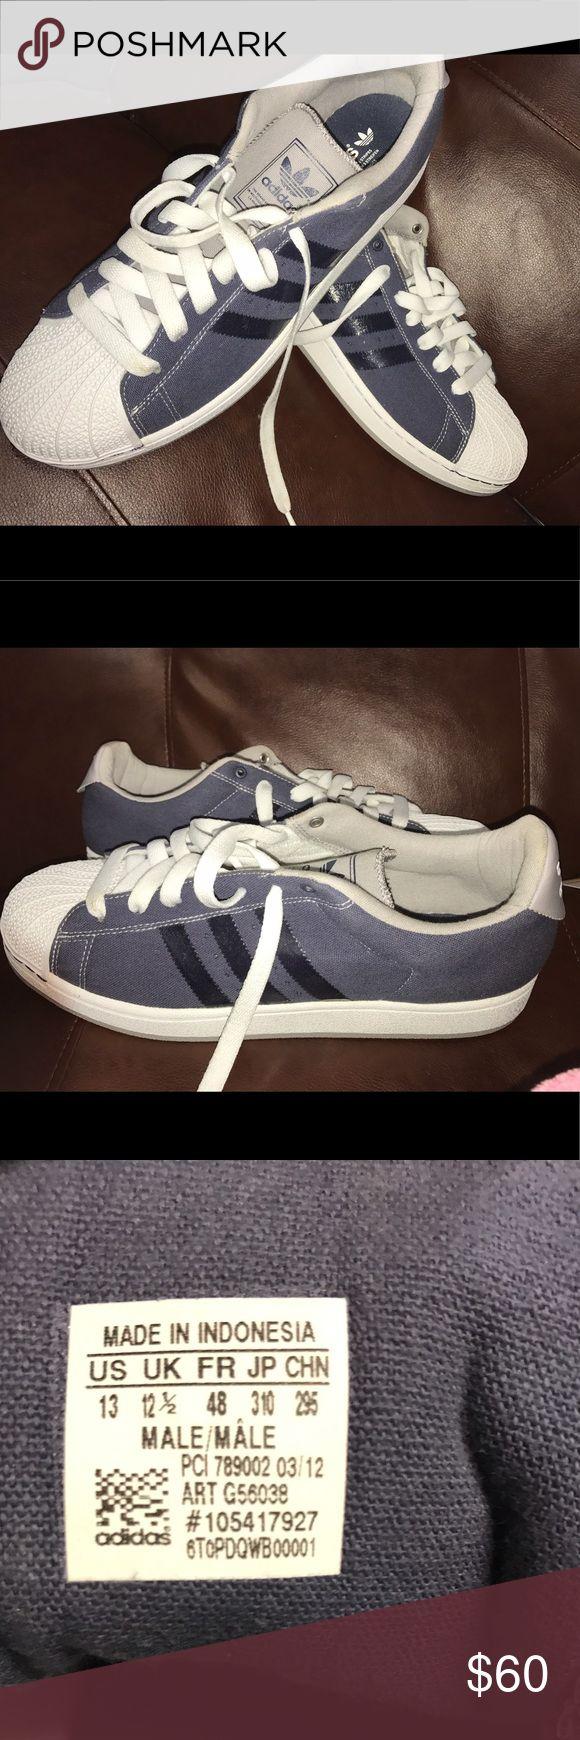 Adidas Originals Superstar II Trainer Grey/ Blue Brand new NEVER WORN, without original box. Adidas Originals Superstar 80s Animal Oddity Canvas Shell Toe Trainer Grey/ Blue, Size 13 Adidas Shoes Sneakers